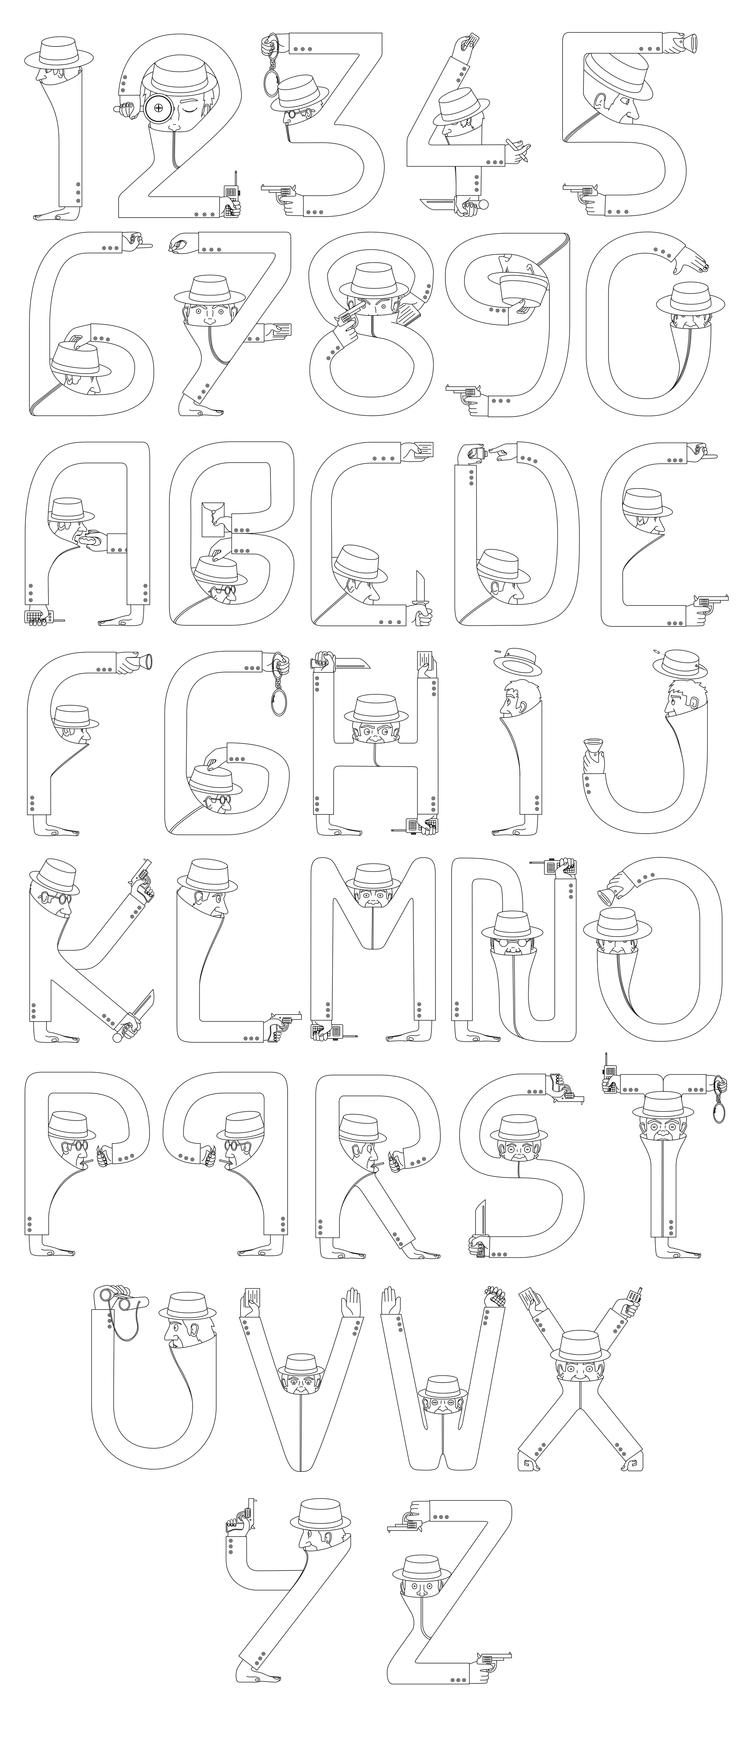 Enjoy  - Typograpghy, Illustration - tomrouleau | ello